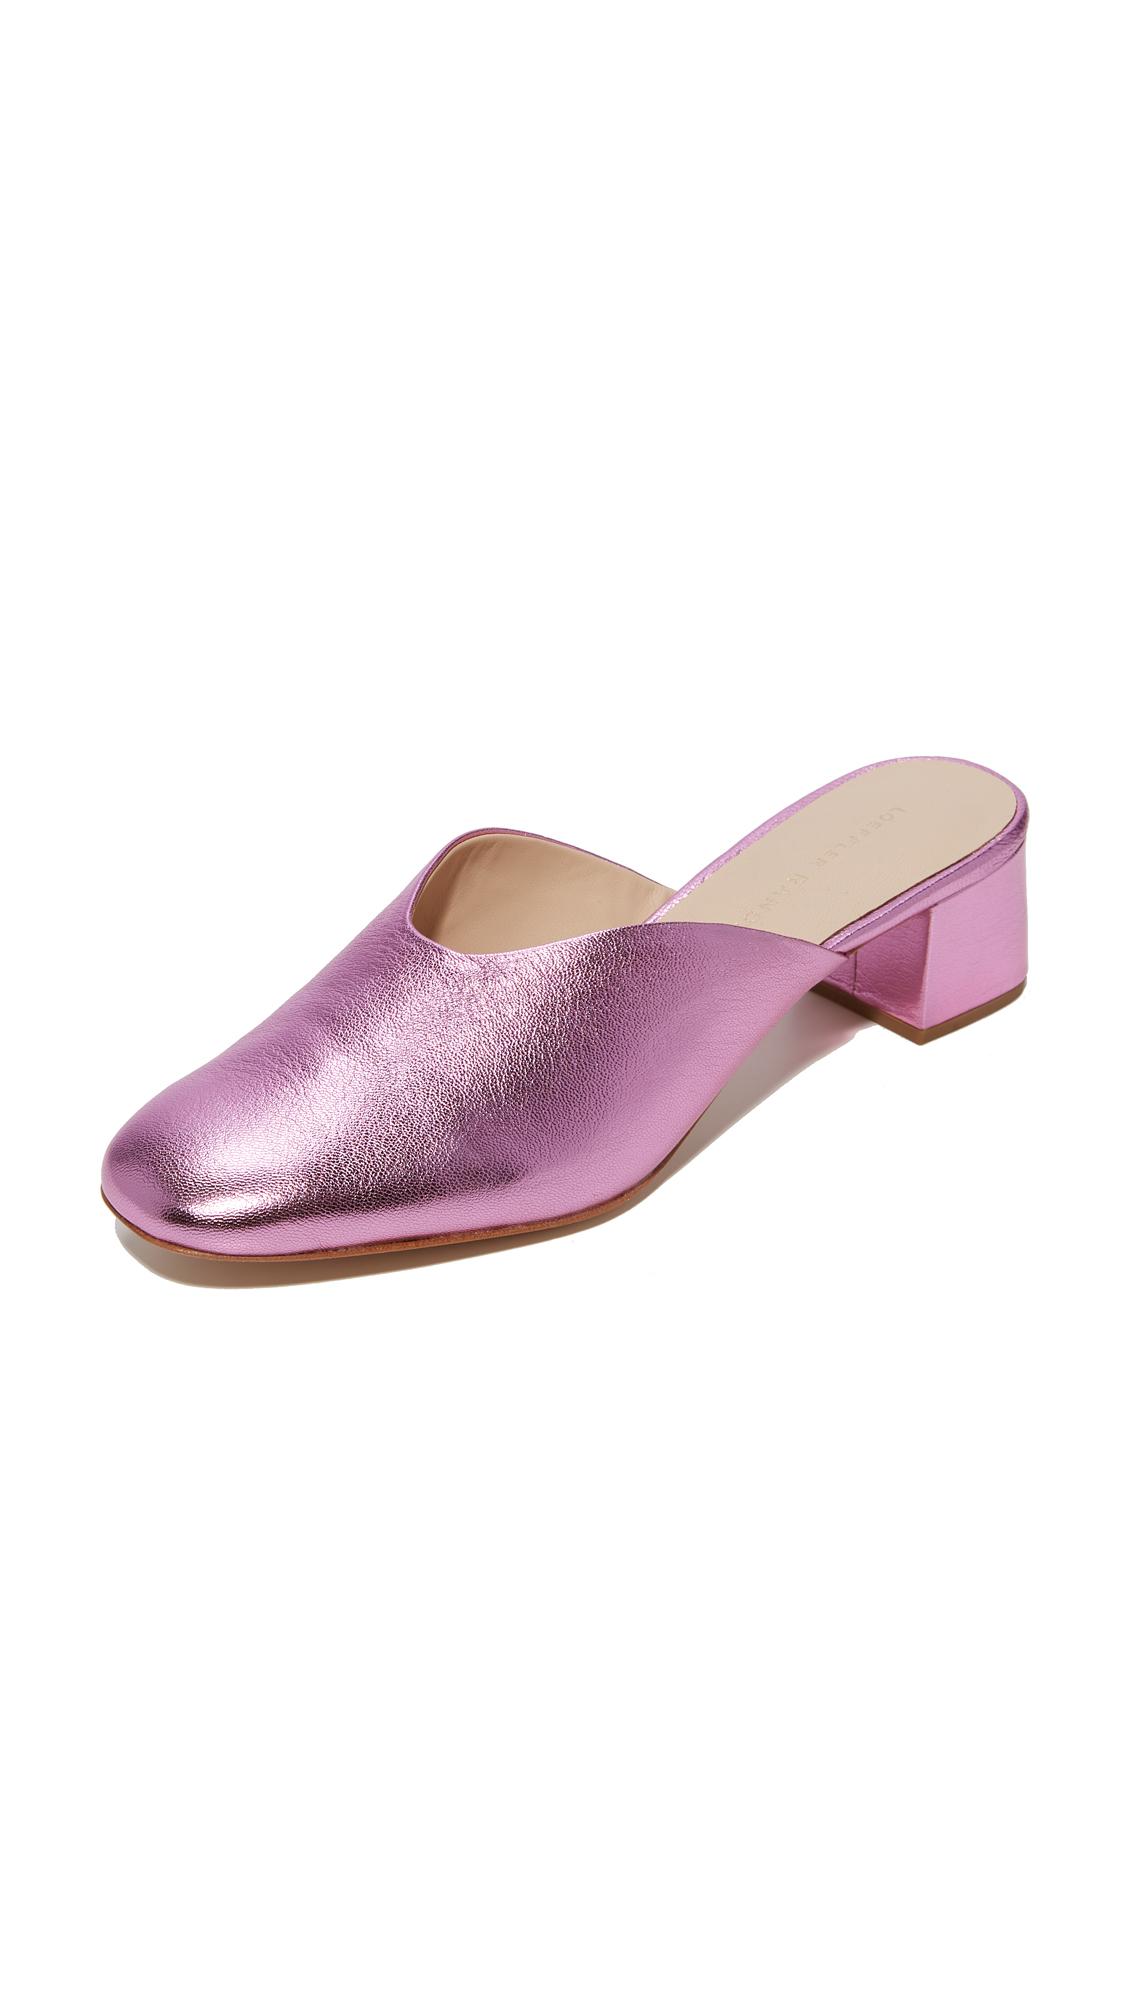 Loeffler Randall Lulu Heeled Mules - Carnation Pink